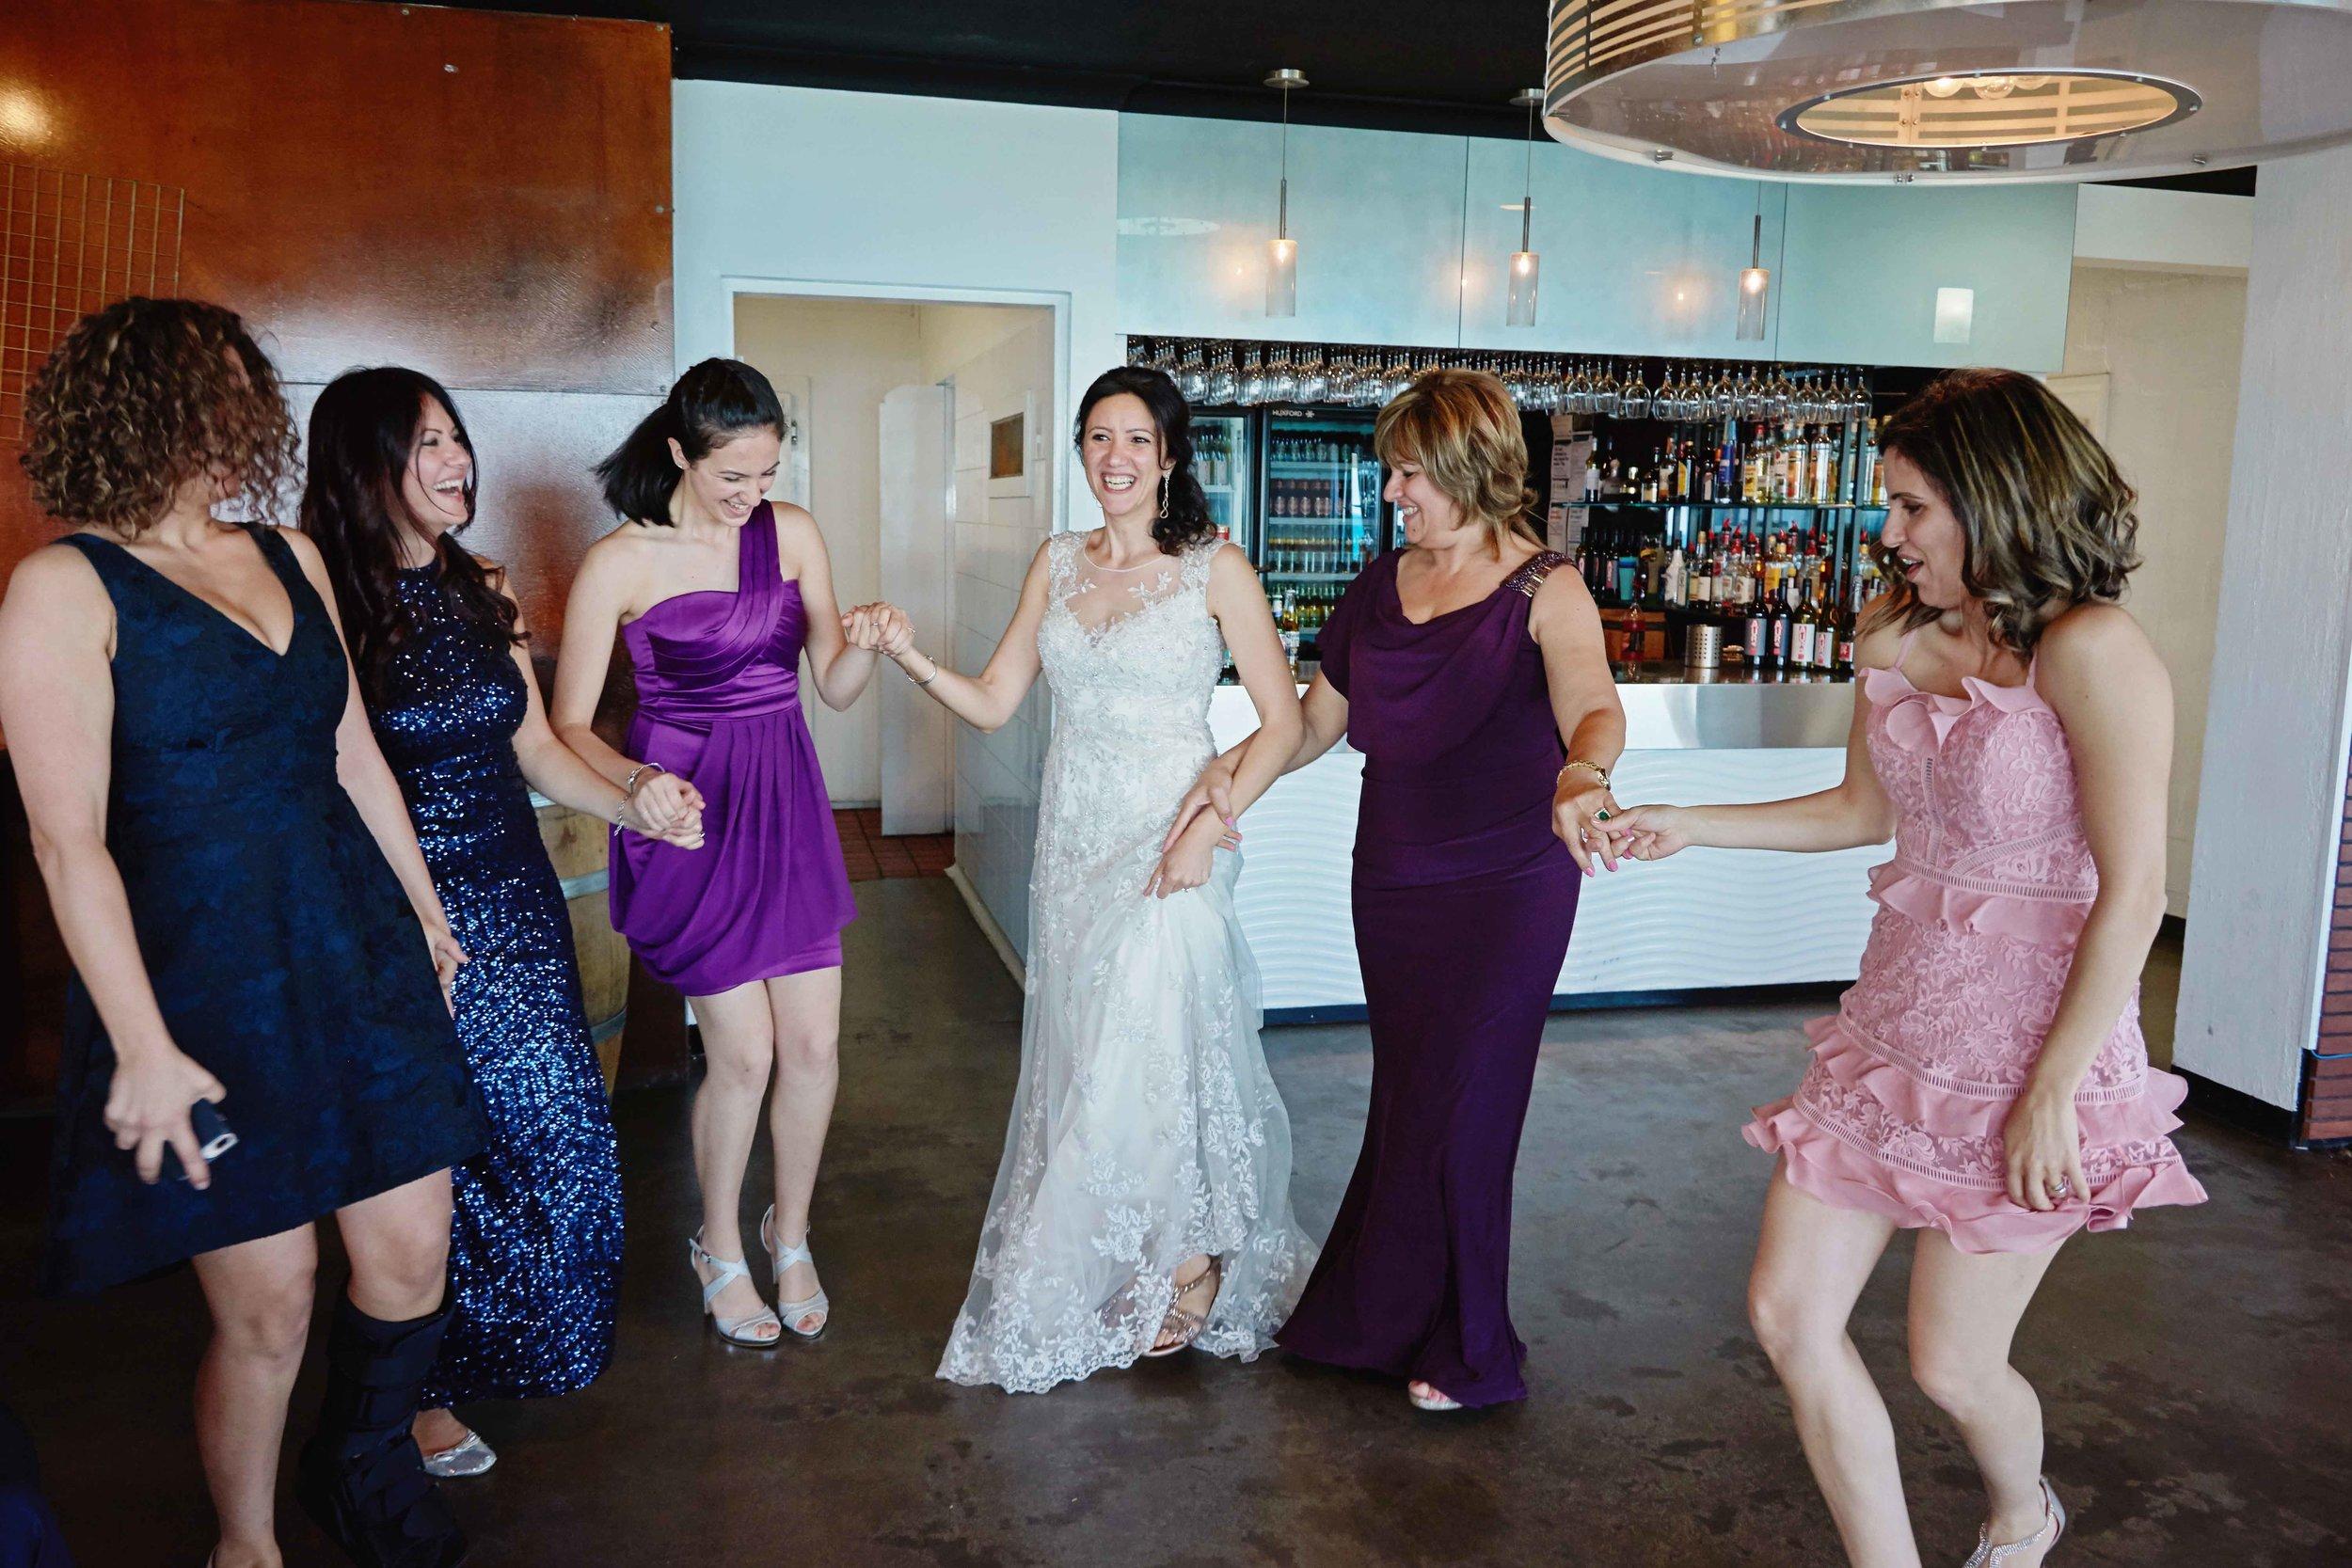 sorrento-wedding-photography-all-smiles-marissa-jade-photography-105.jpg